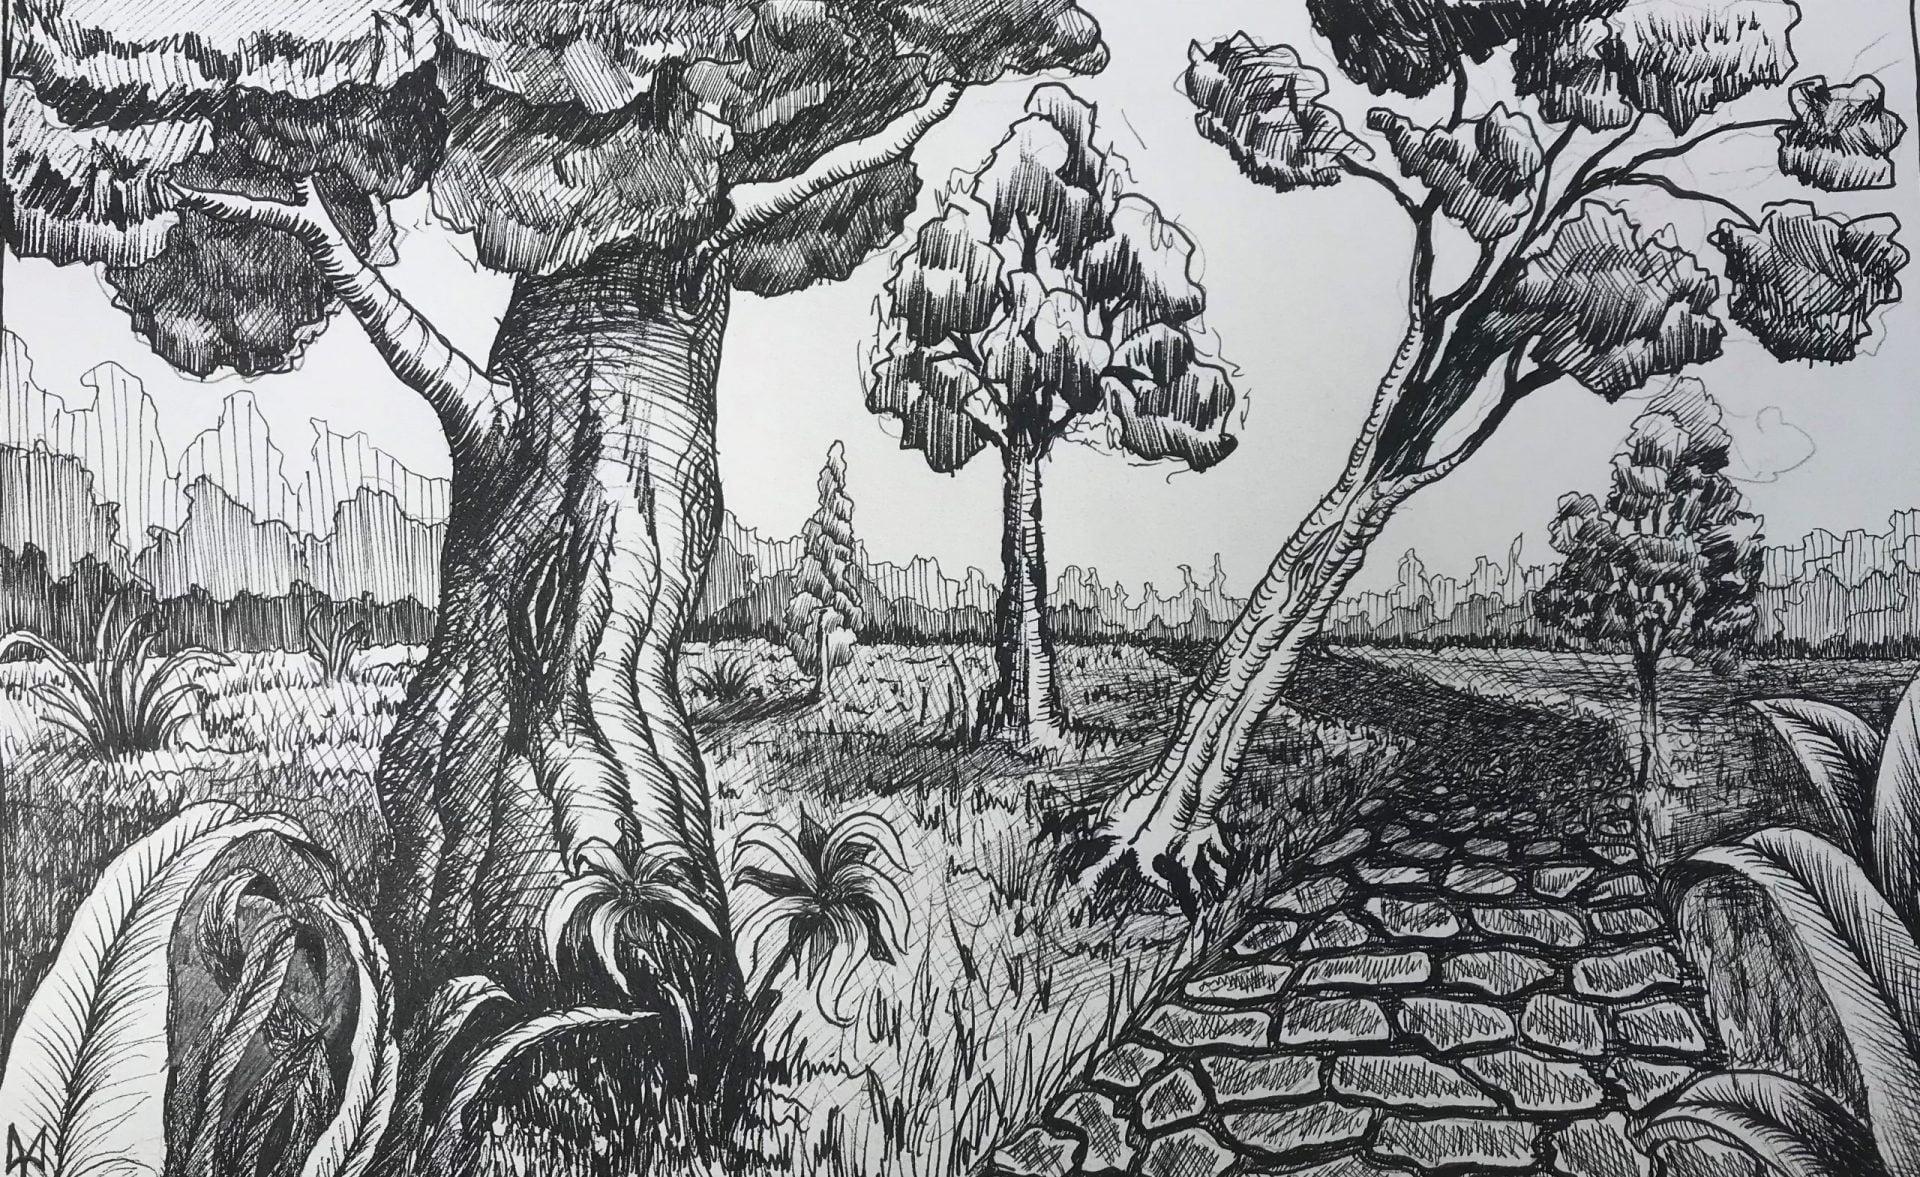 Forest. Pencil and ink pen. Mykola Babiy